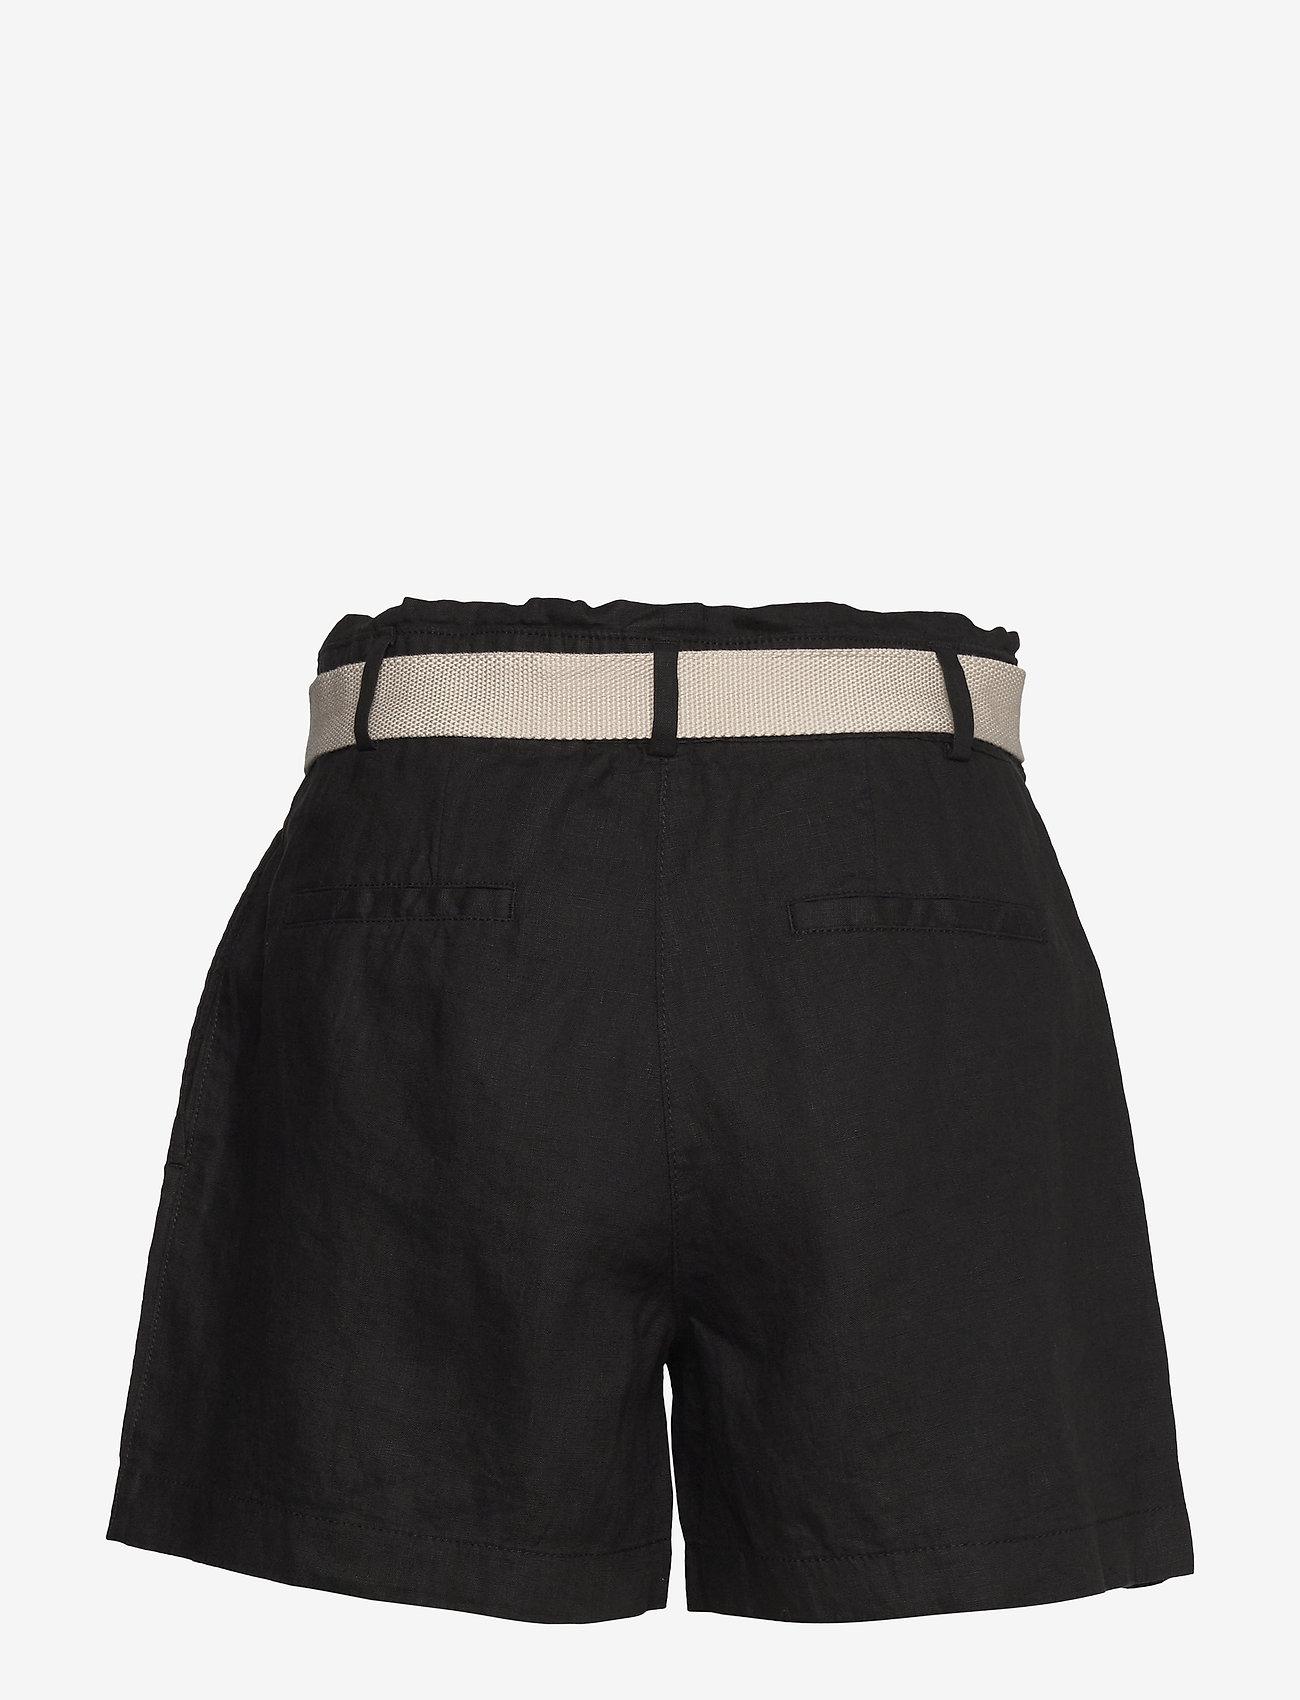 Shorts Woven (Black) (349.99 kr) - Esprit Casual